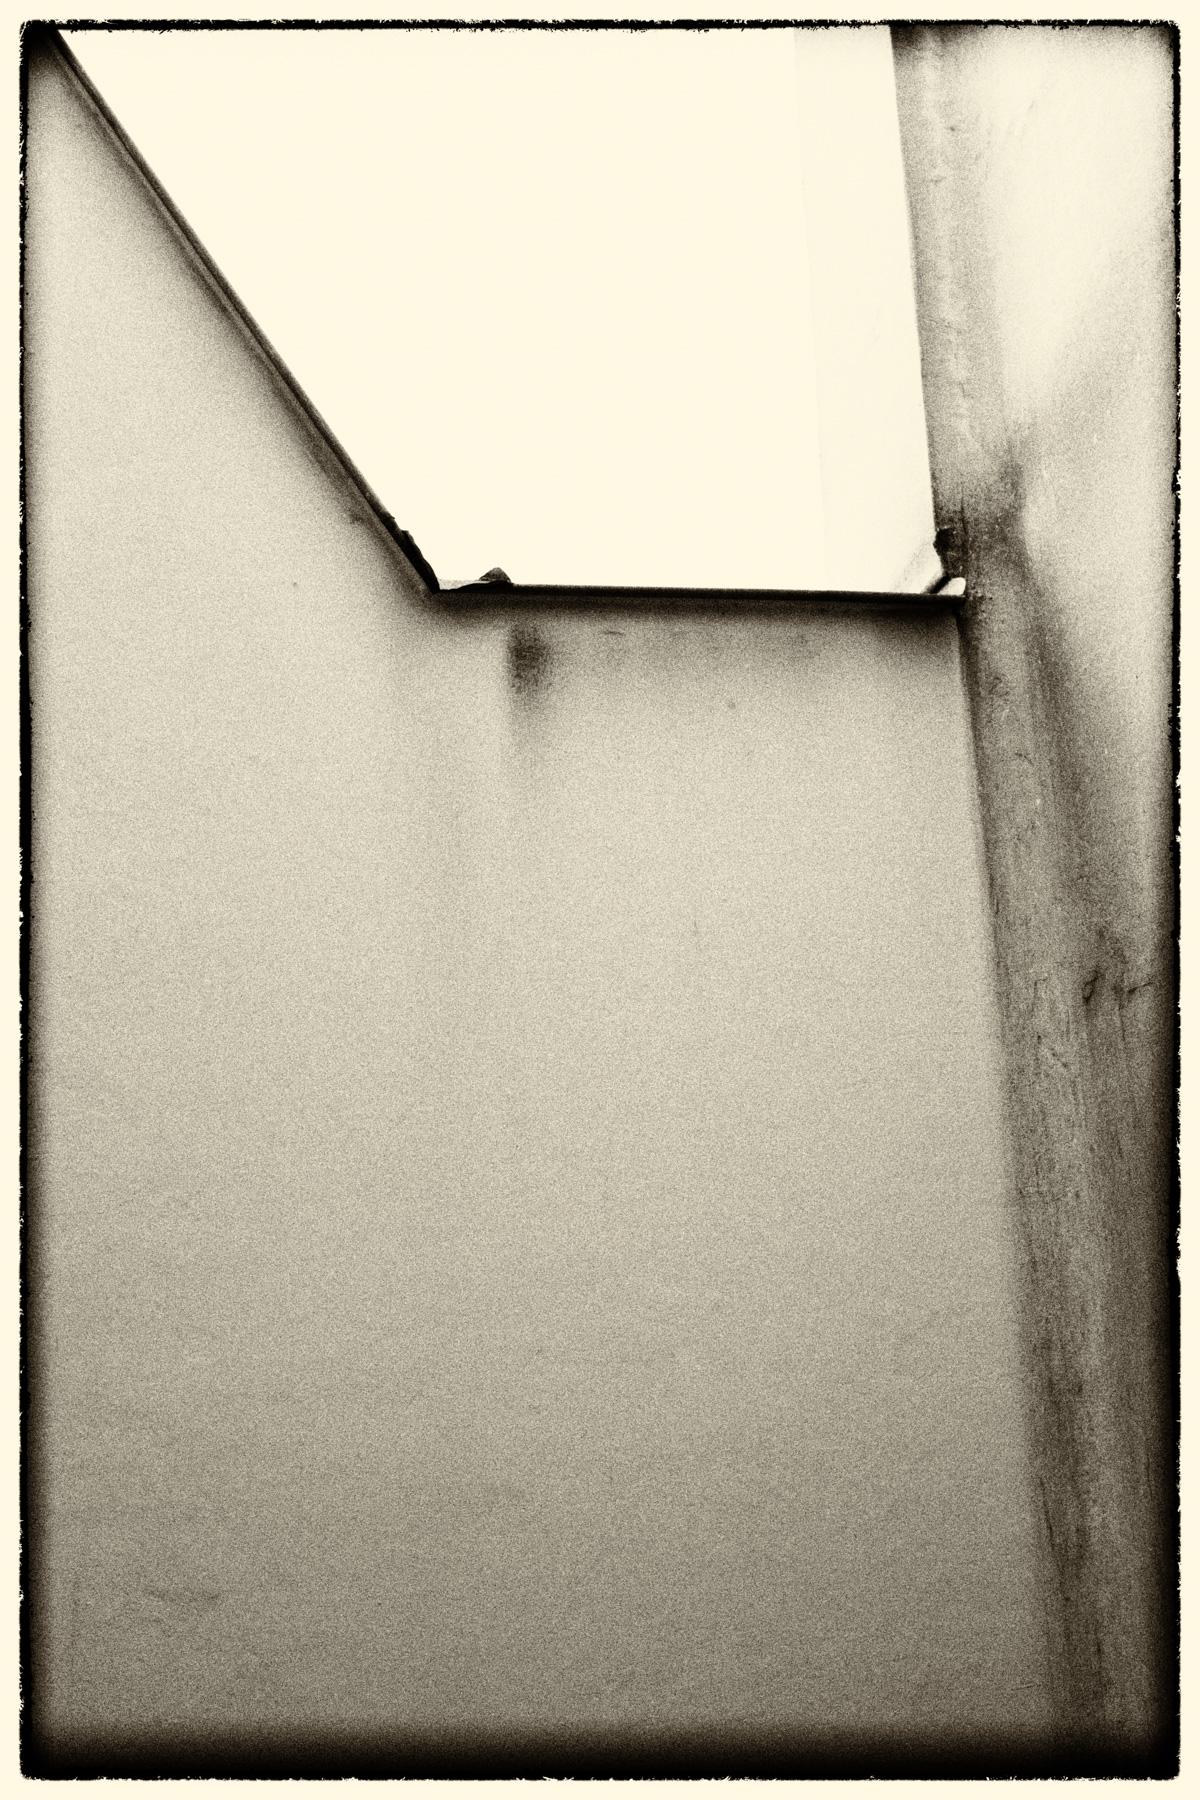 BW_Abstract_Wall